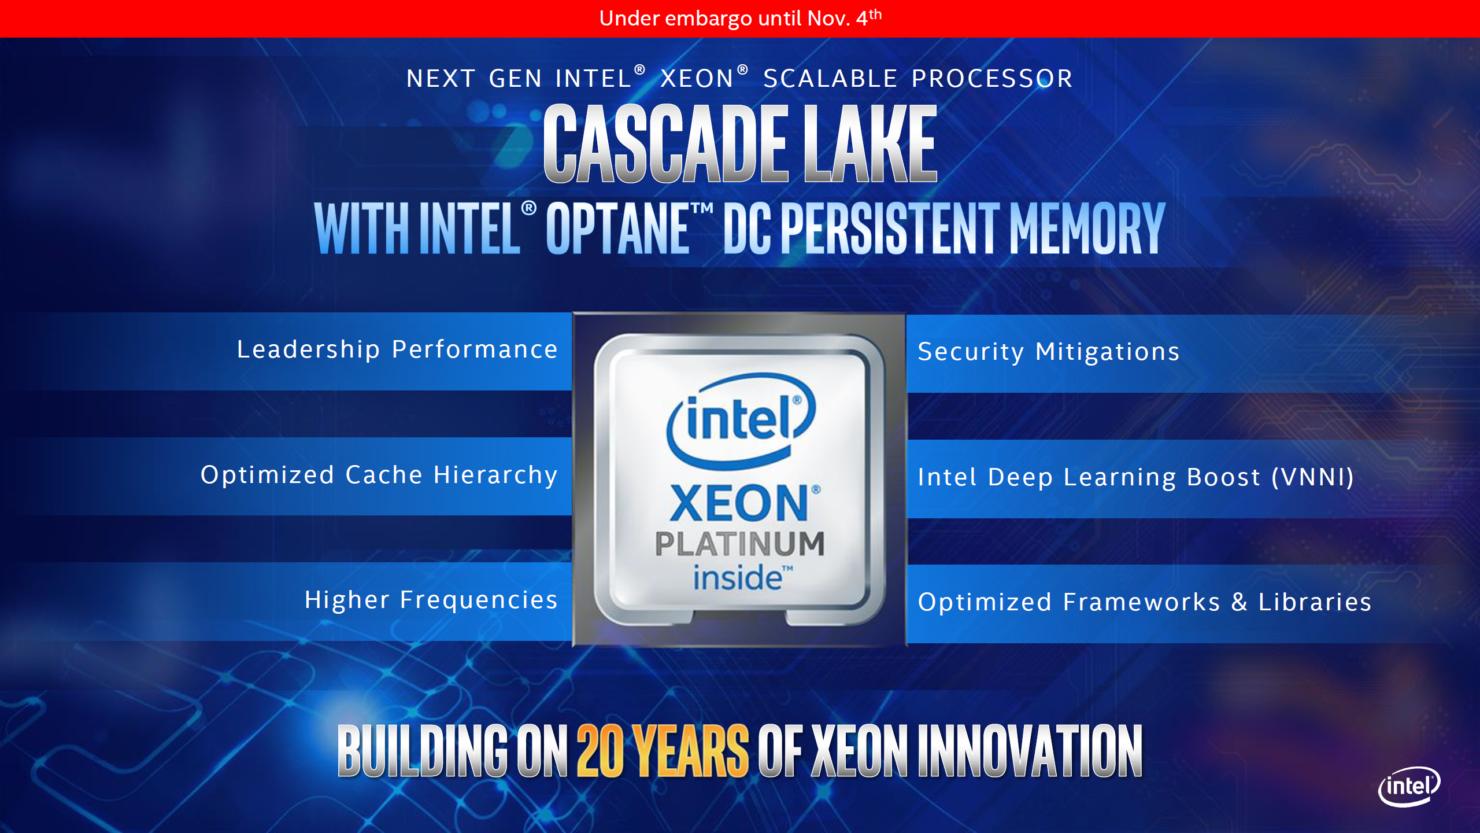 intel-data-center_cascade-lake_1